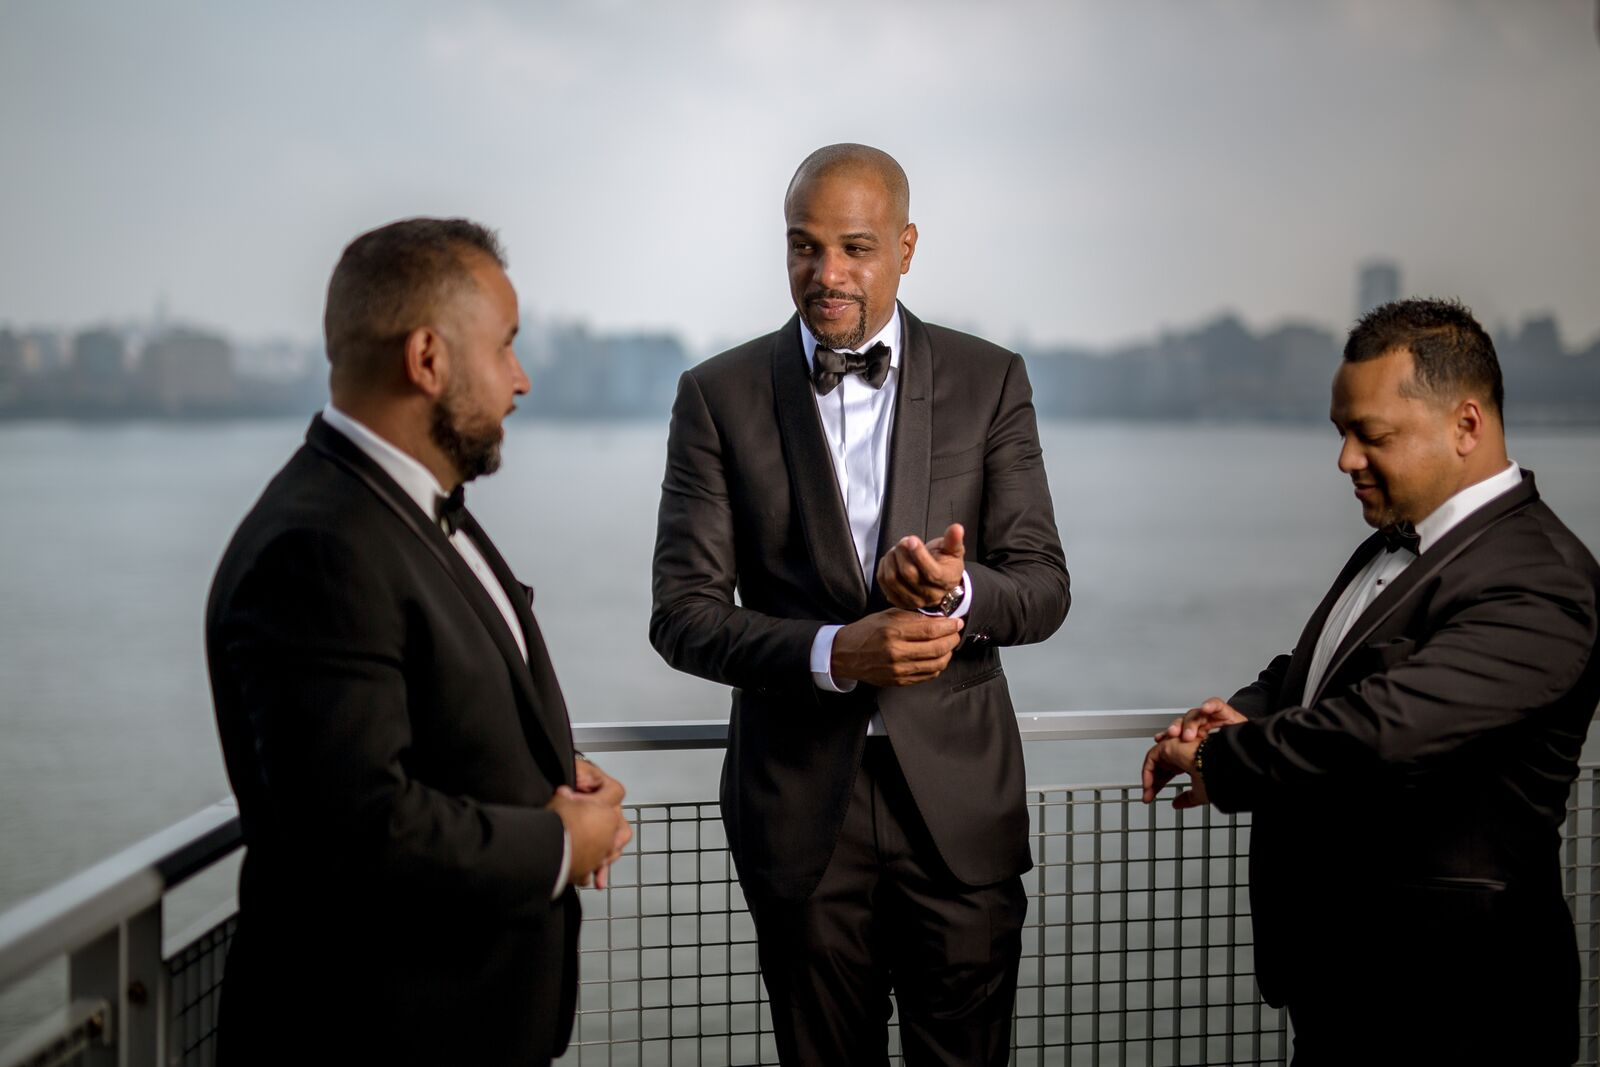 groom and groomsmen in black tuxedos